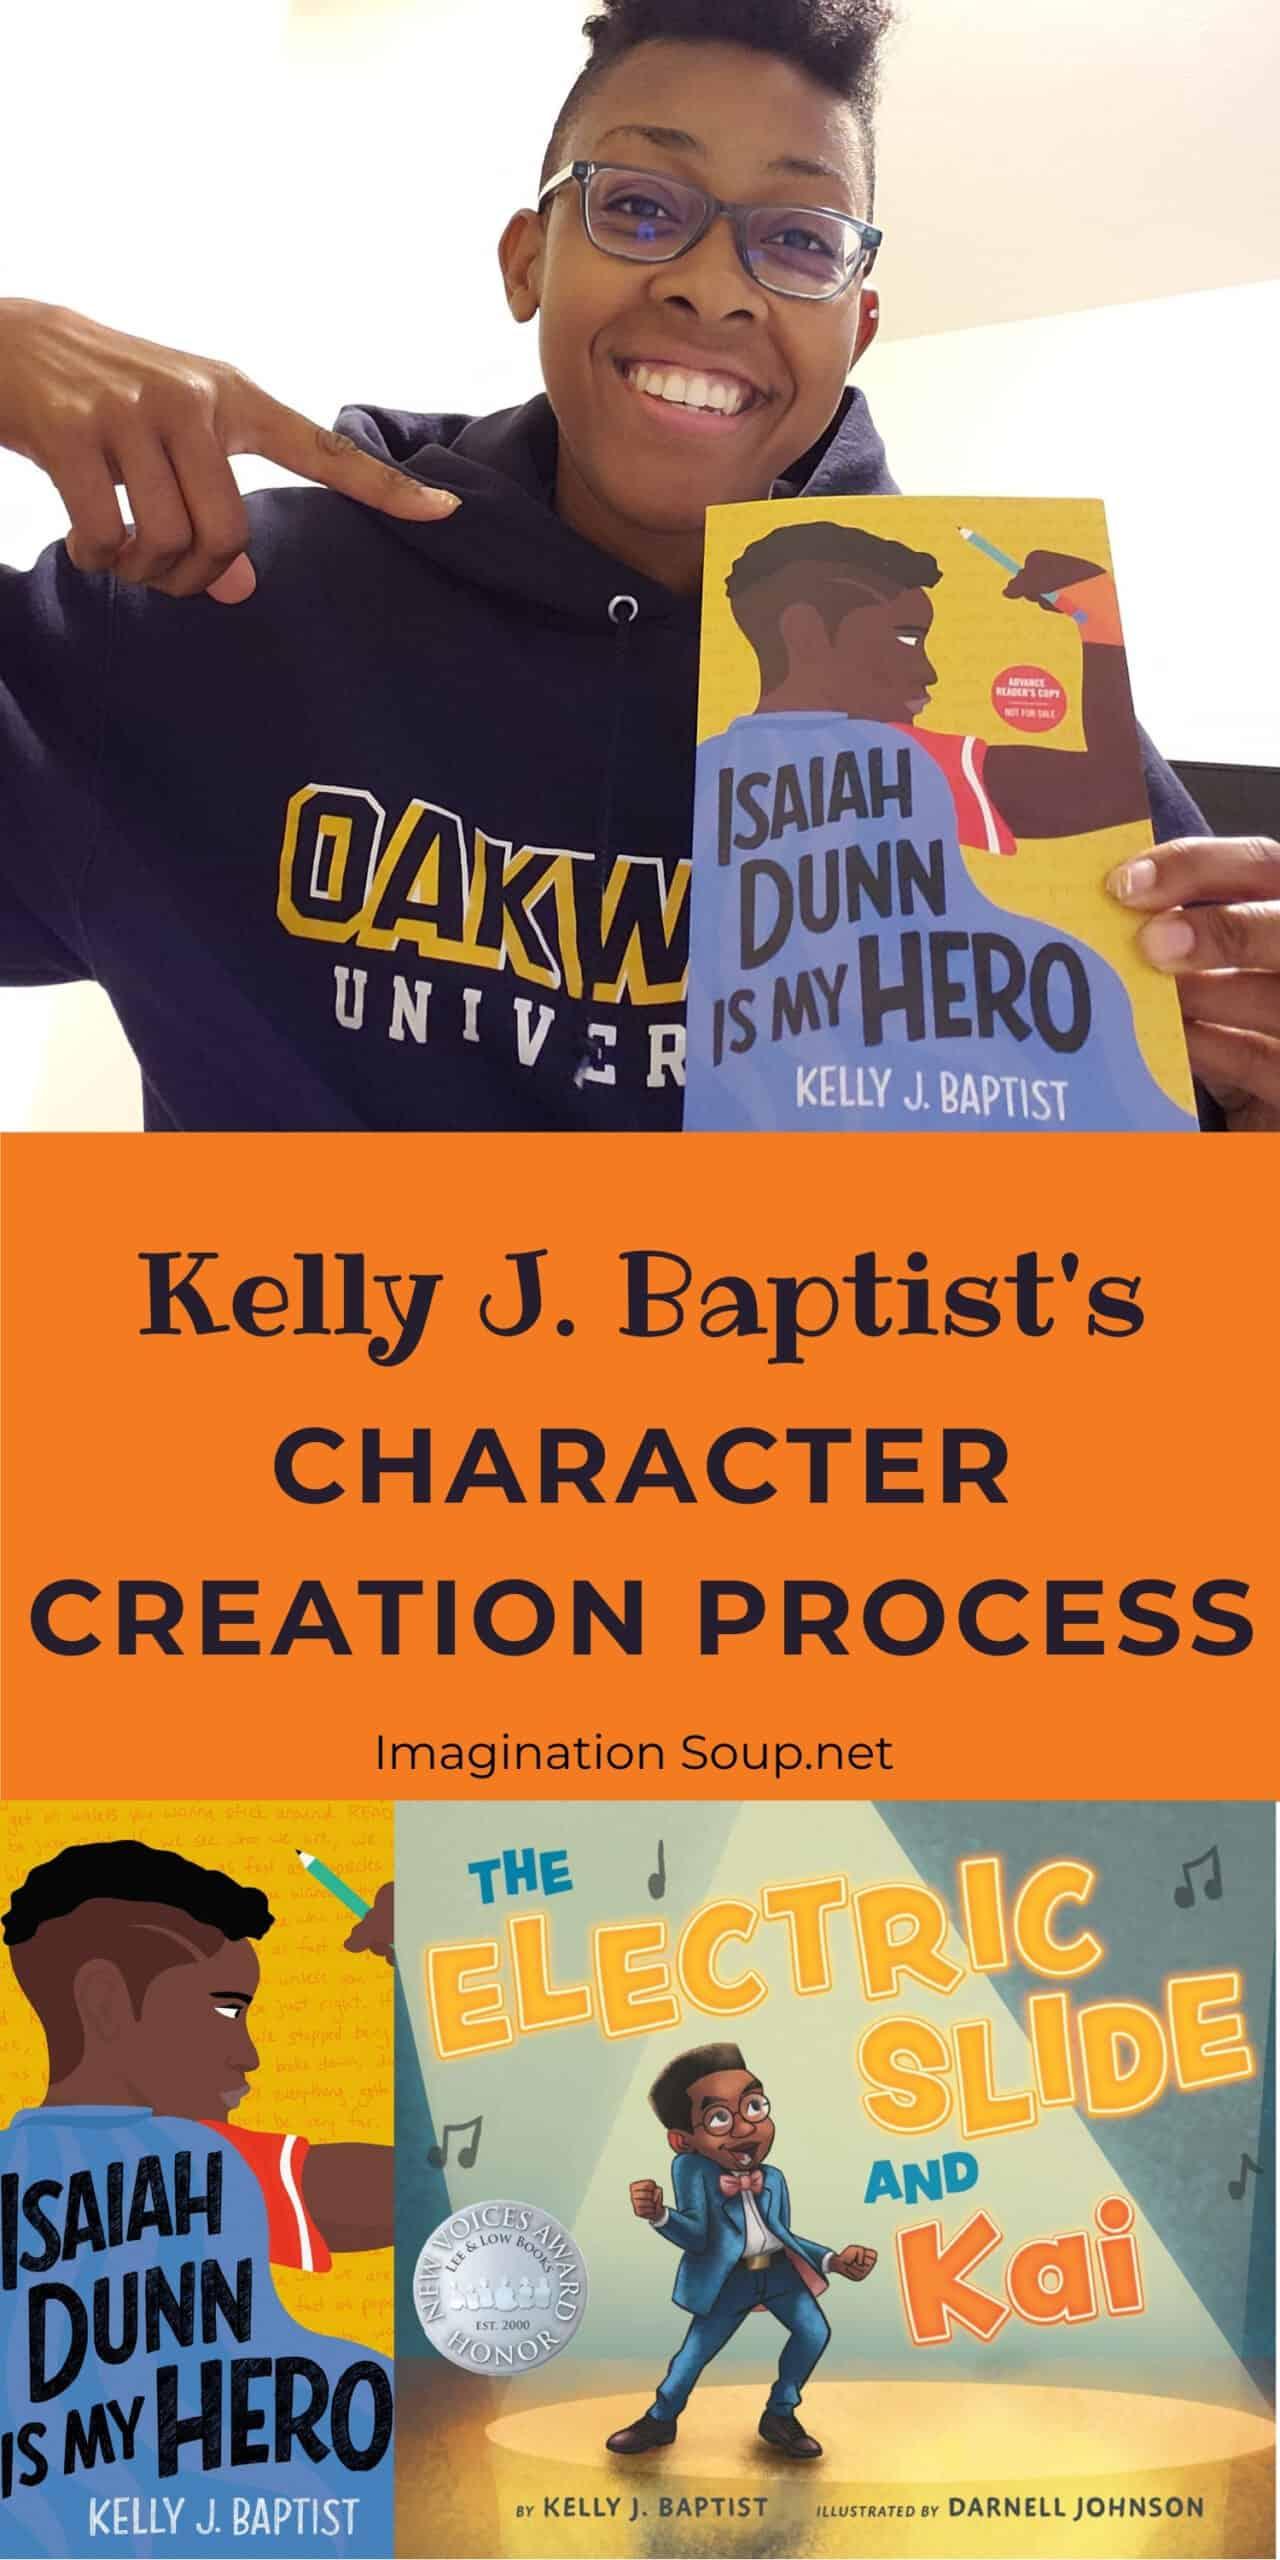 Kelly J. Baptist's writing process